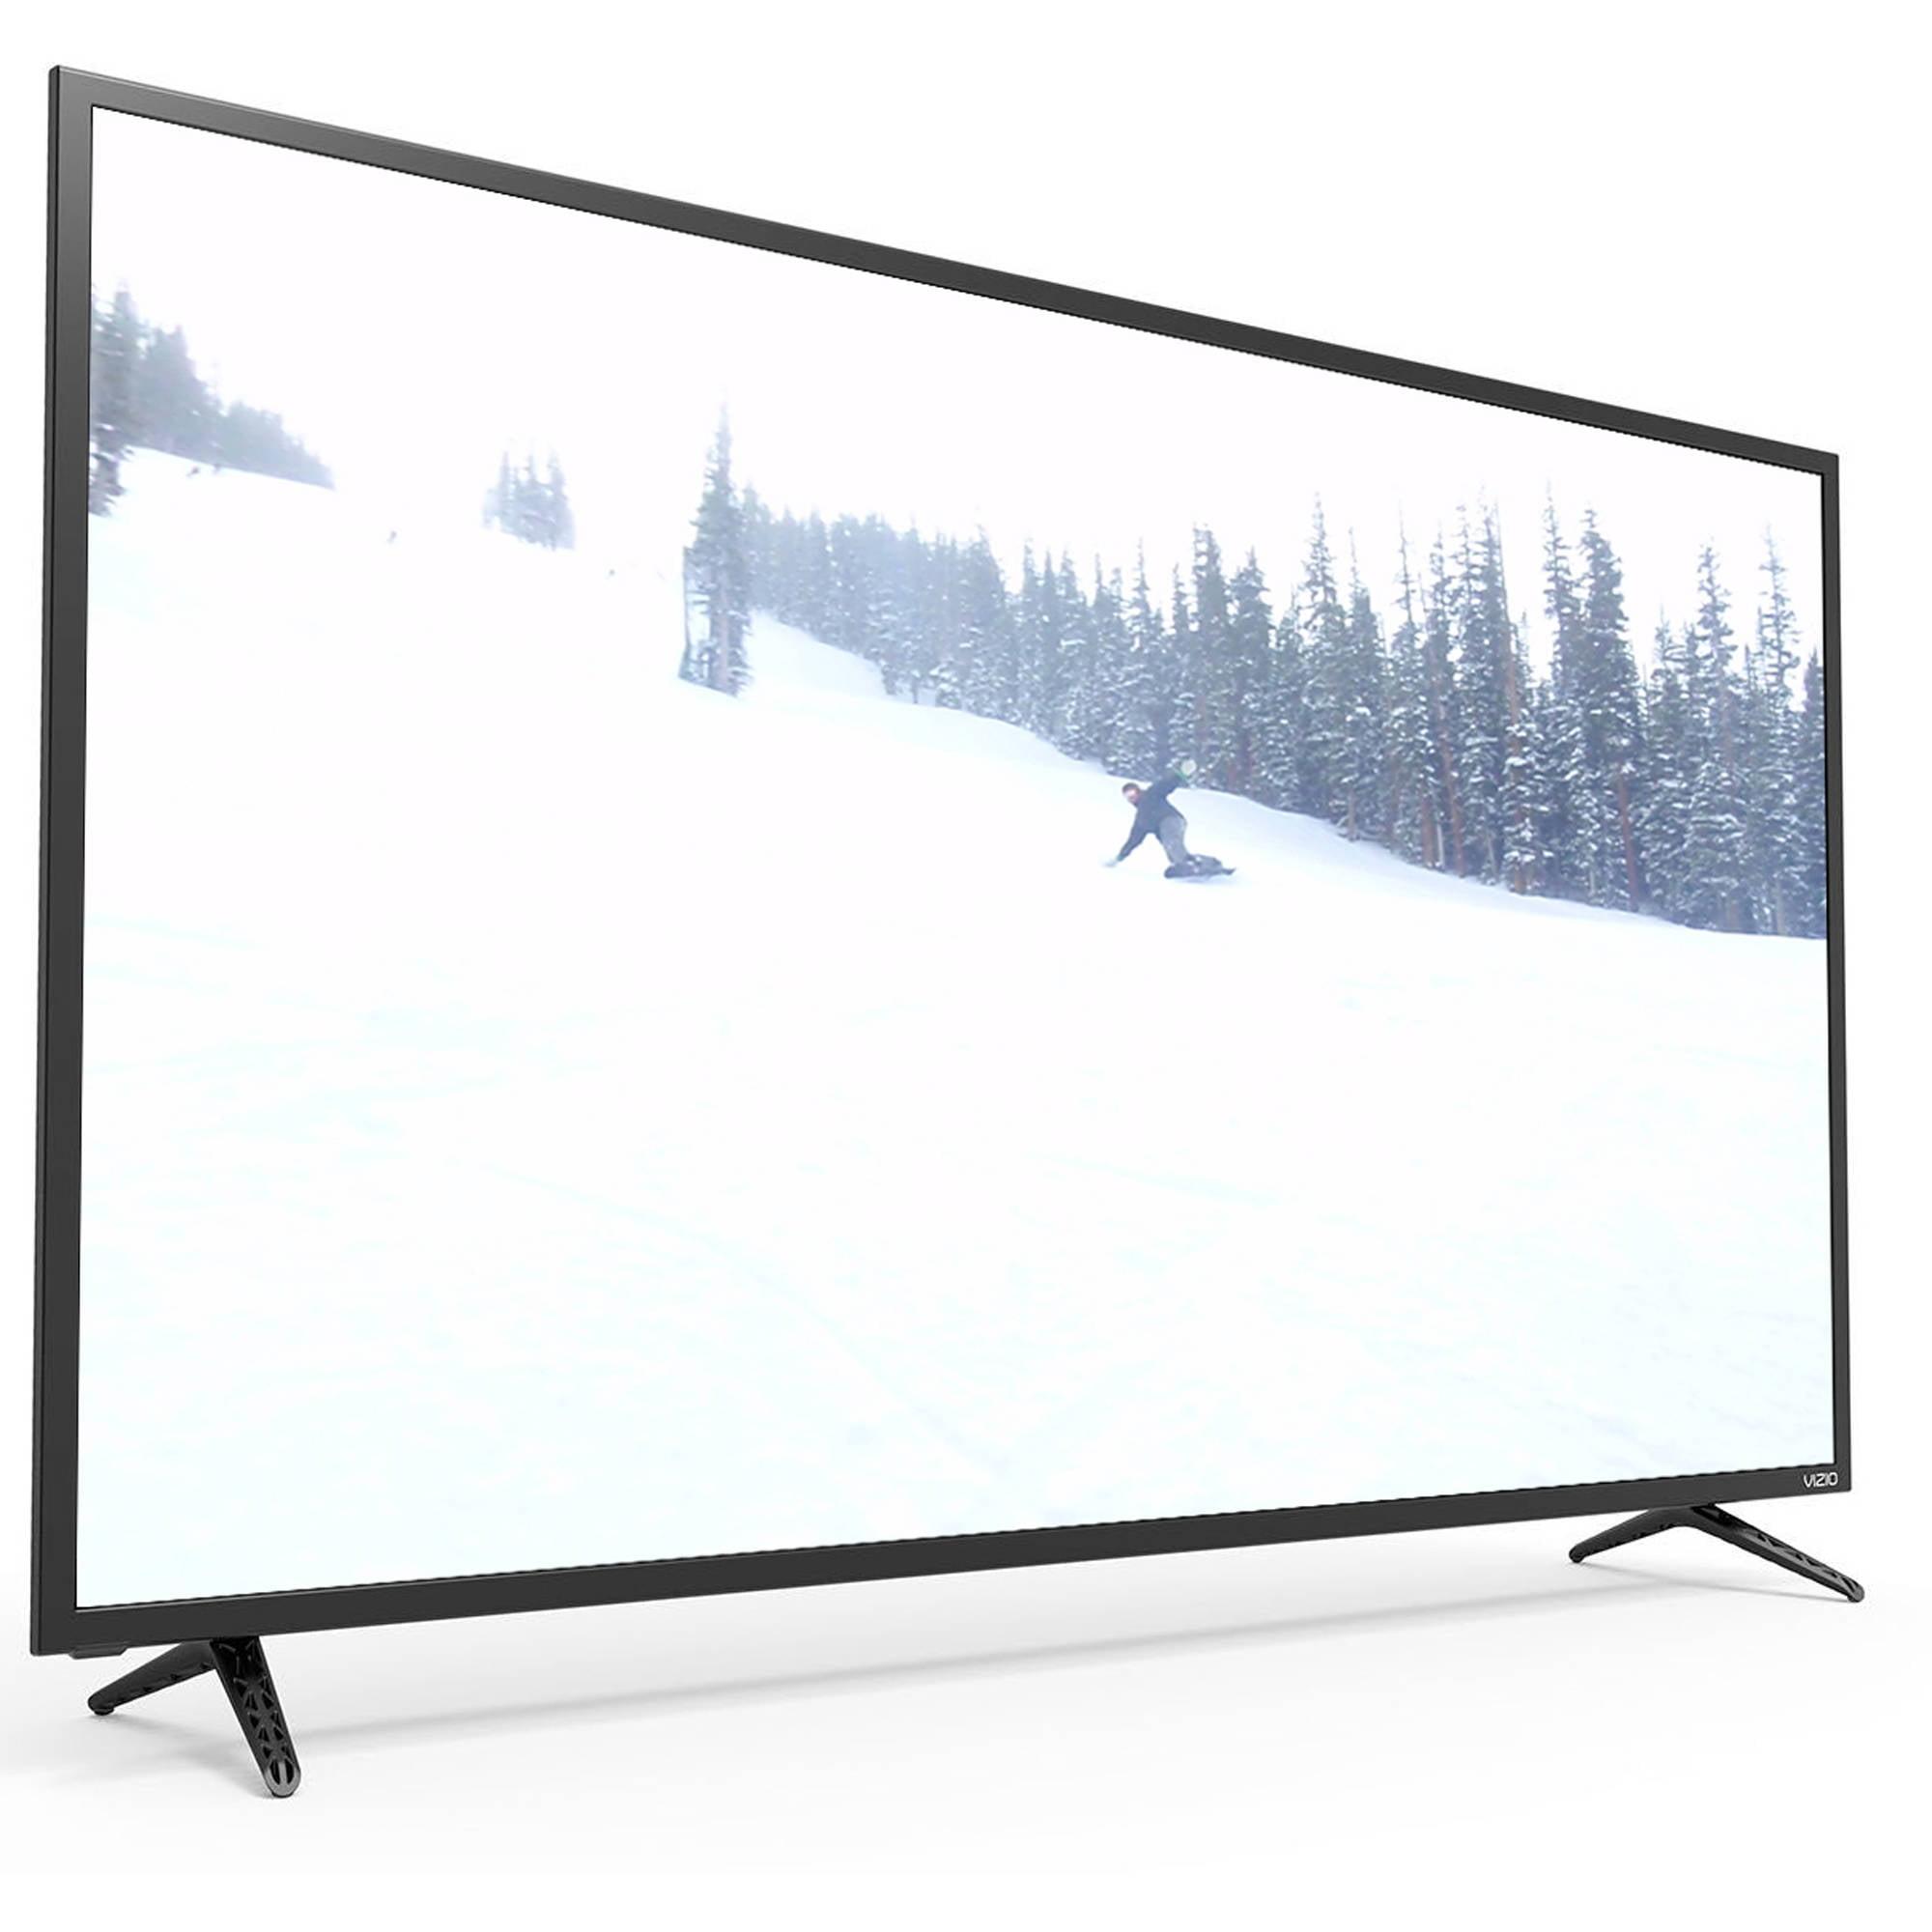 Refurbished Vizio 48 Class 4K (2160P) Smart LED TV (E48U - D0)